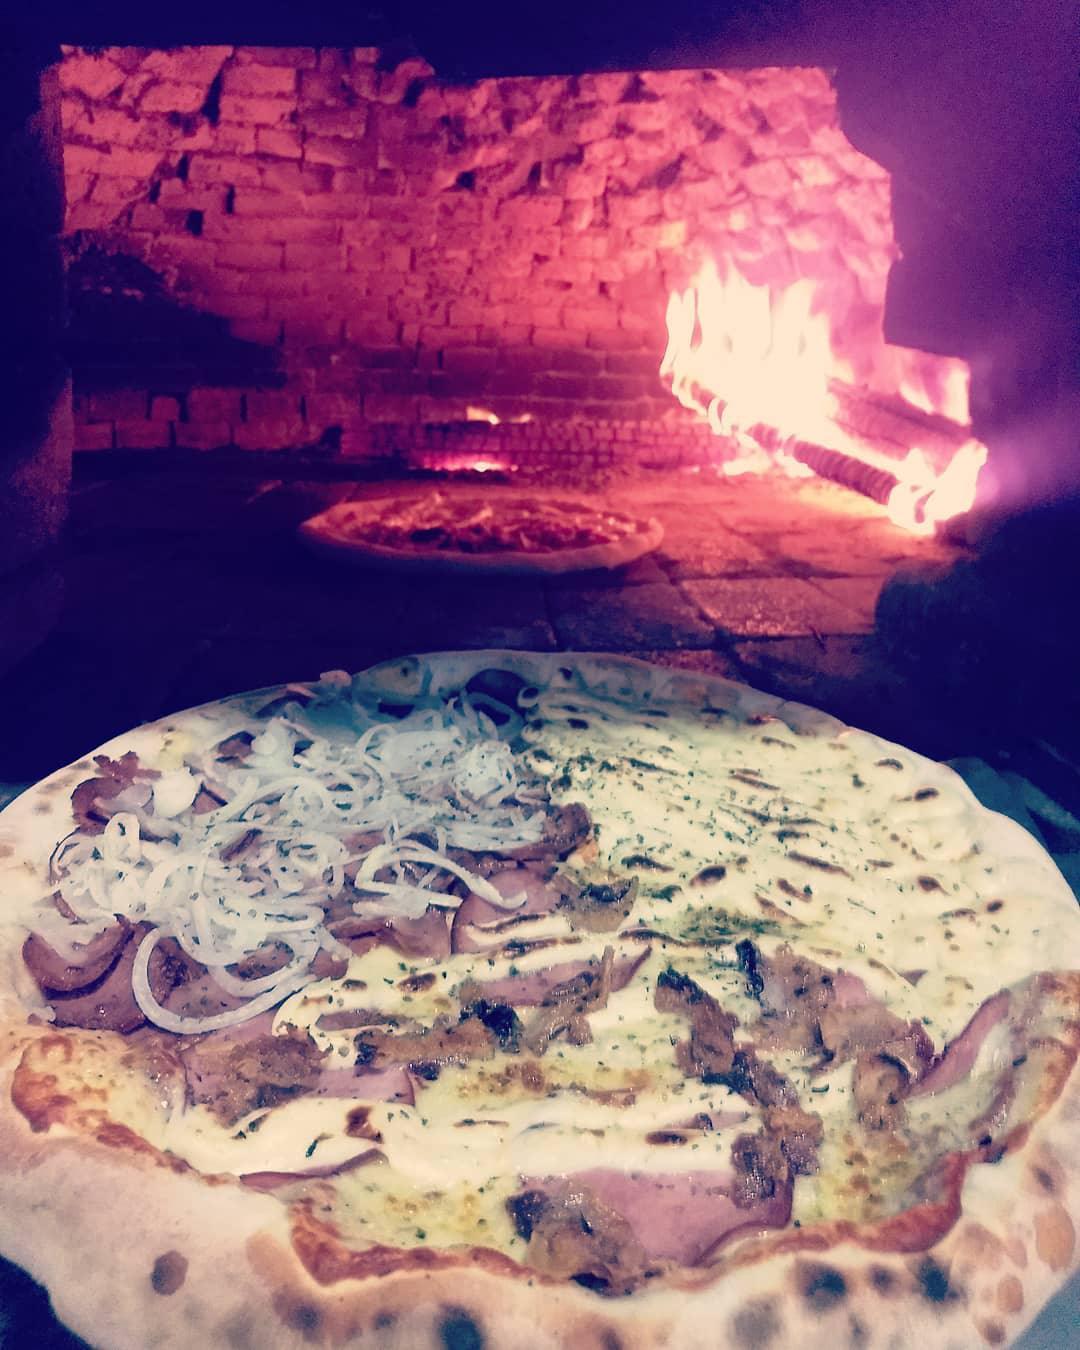 Pizzaria Vicesy